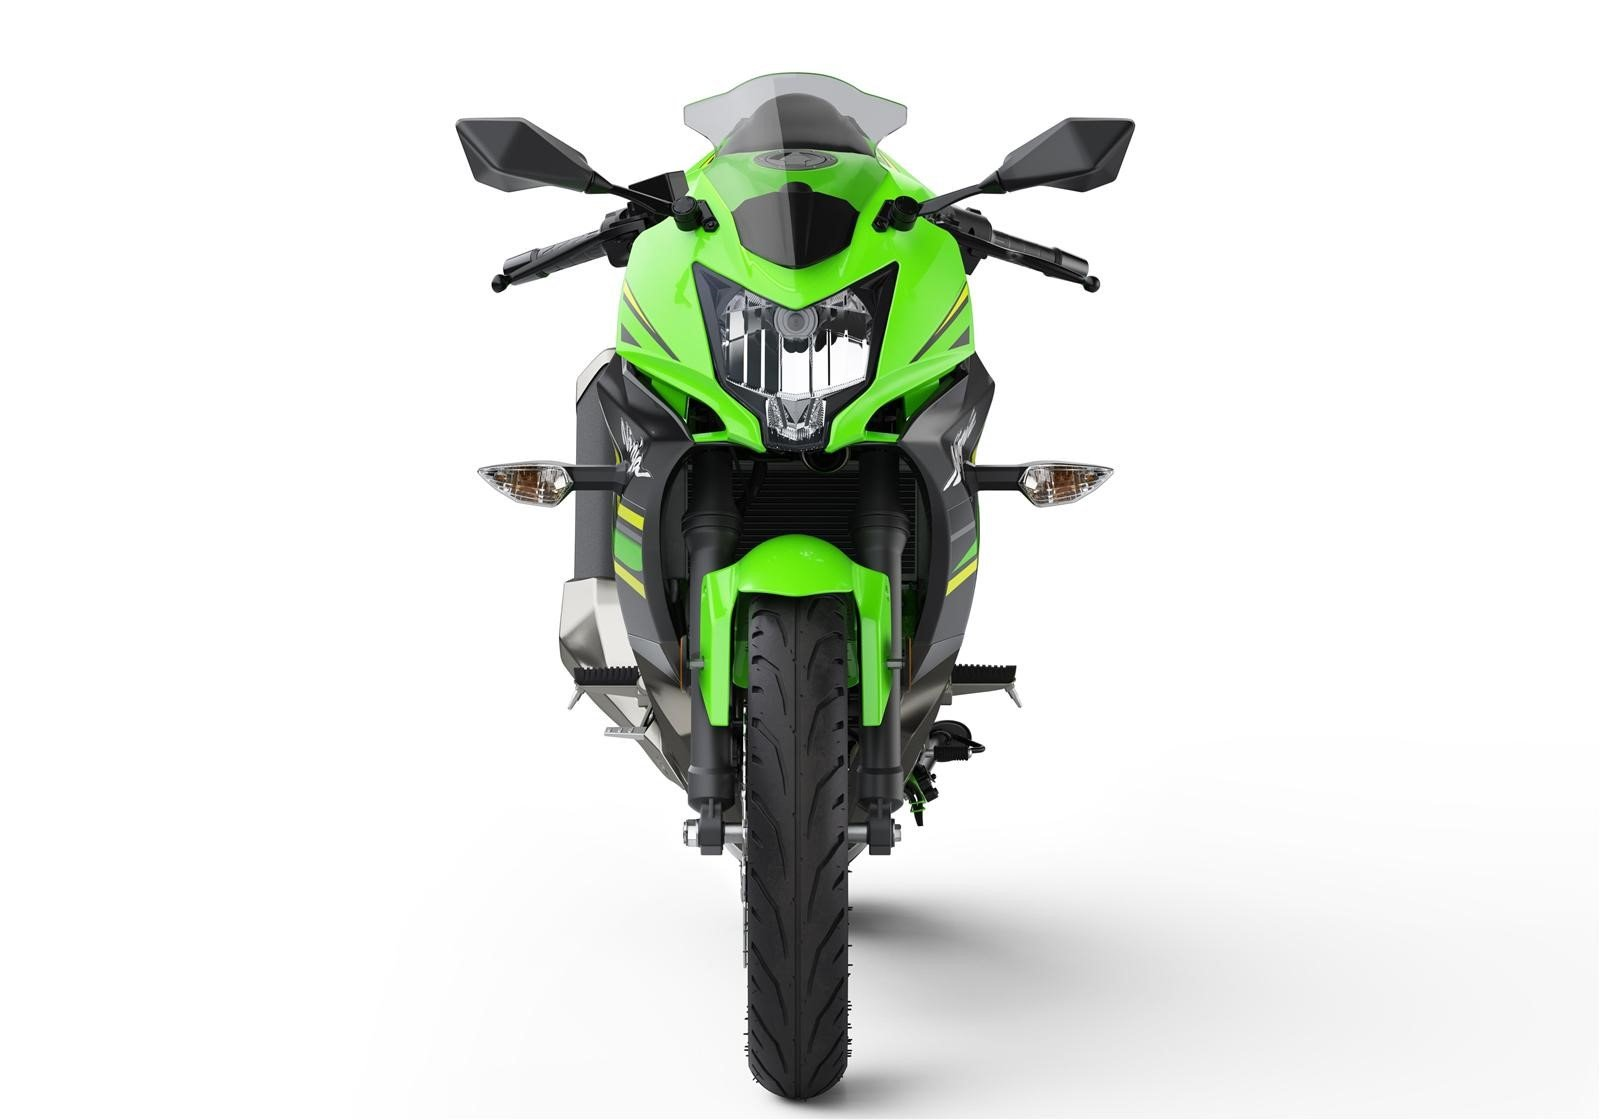 New 2019 Kawasaki Ninja 125 ABS KRT**SAVE £800!!** For Sale (picture 3 of 6)